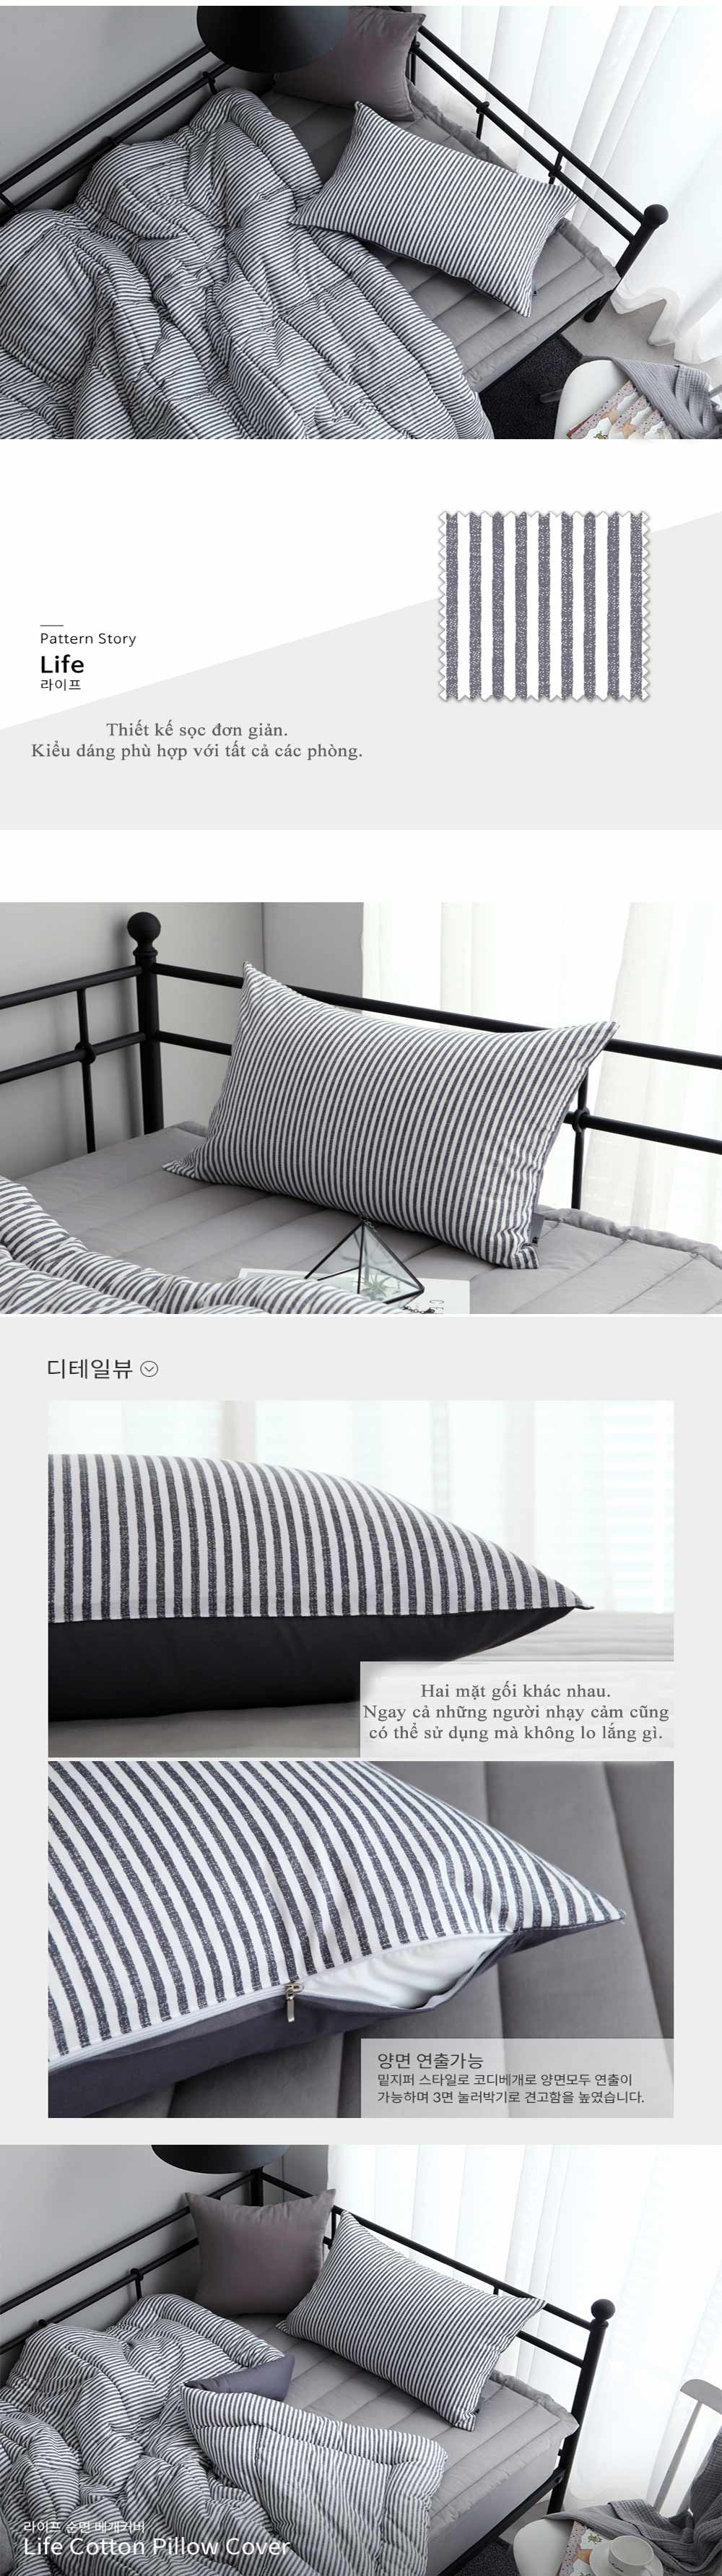 Gối giường cao cấp